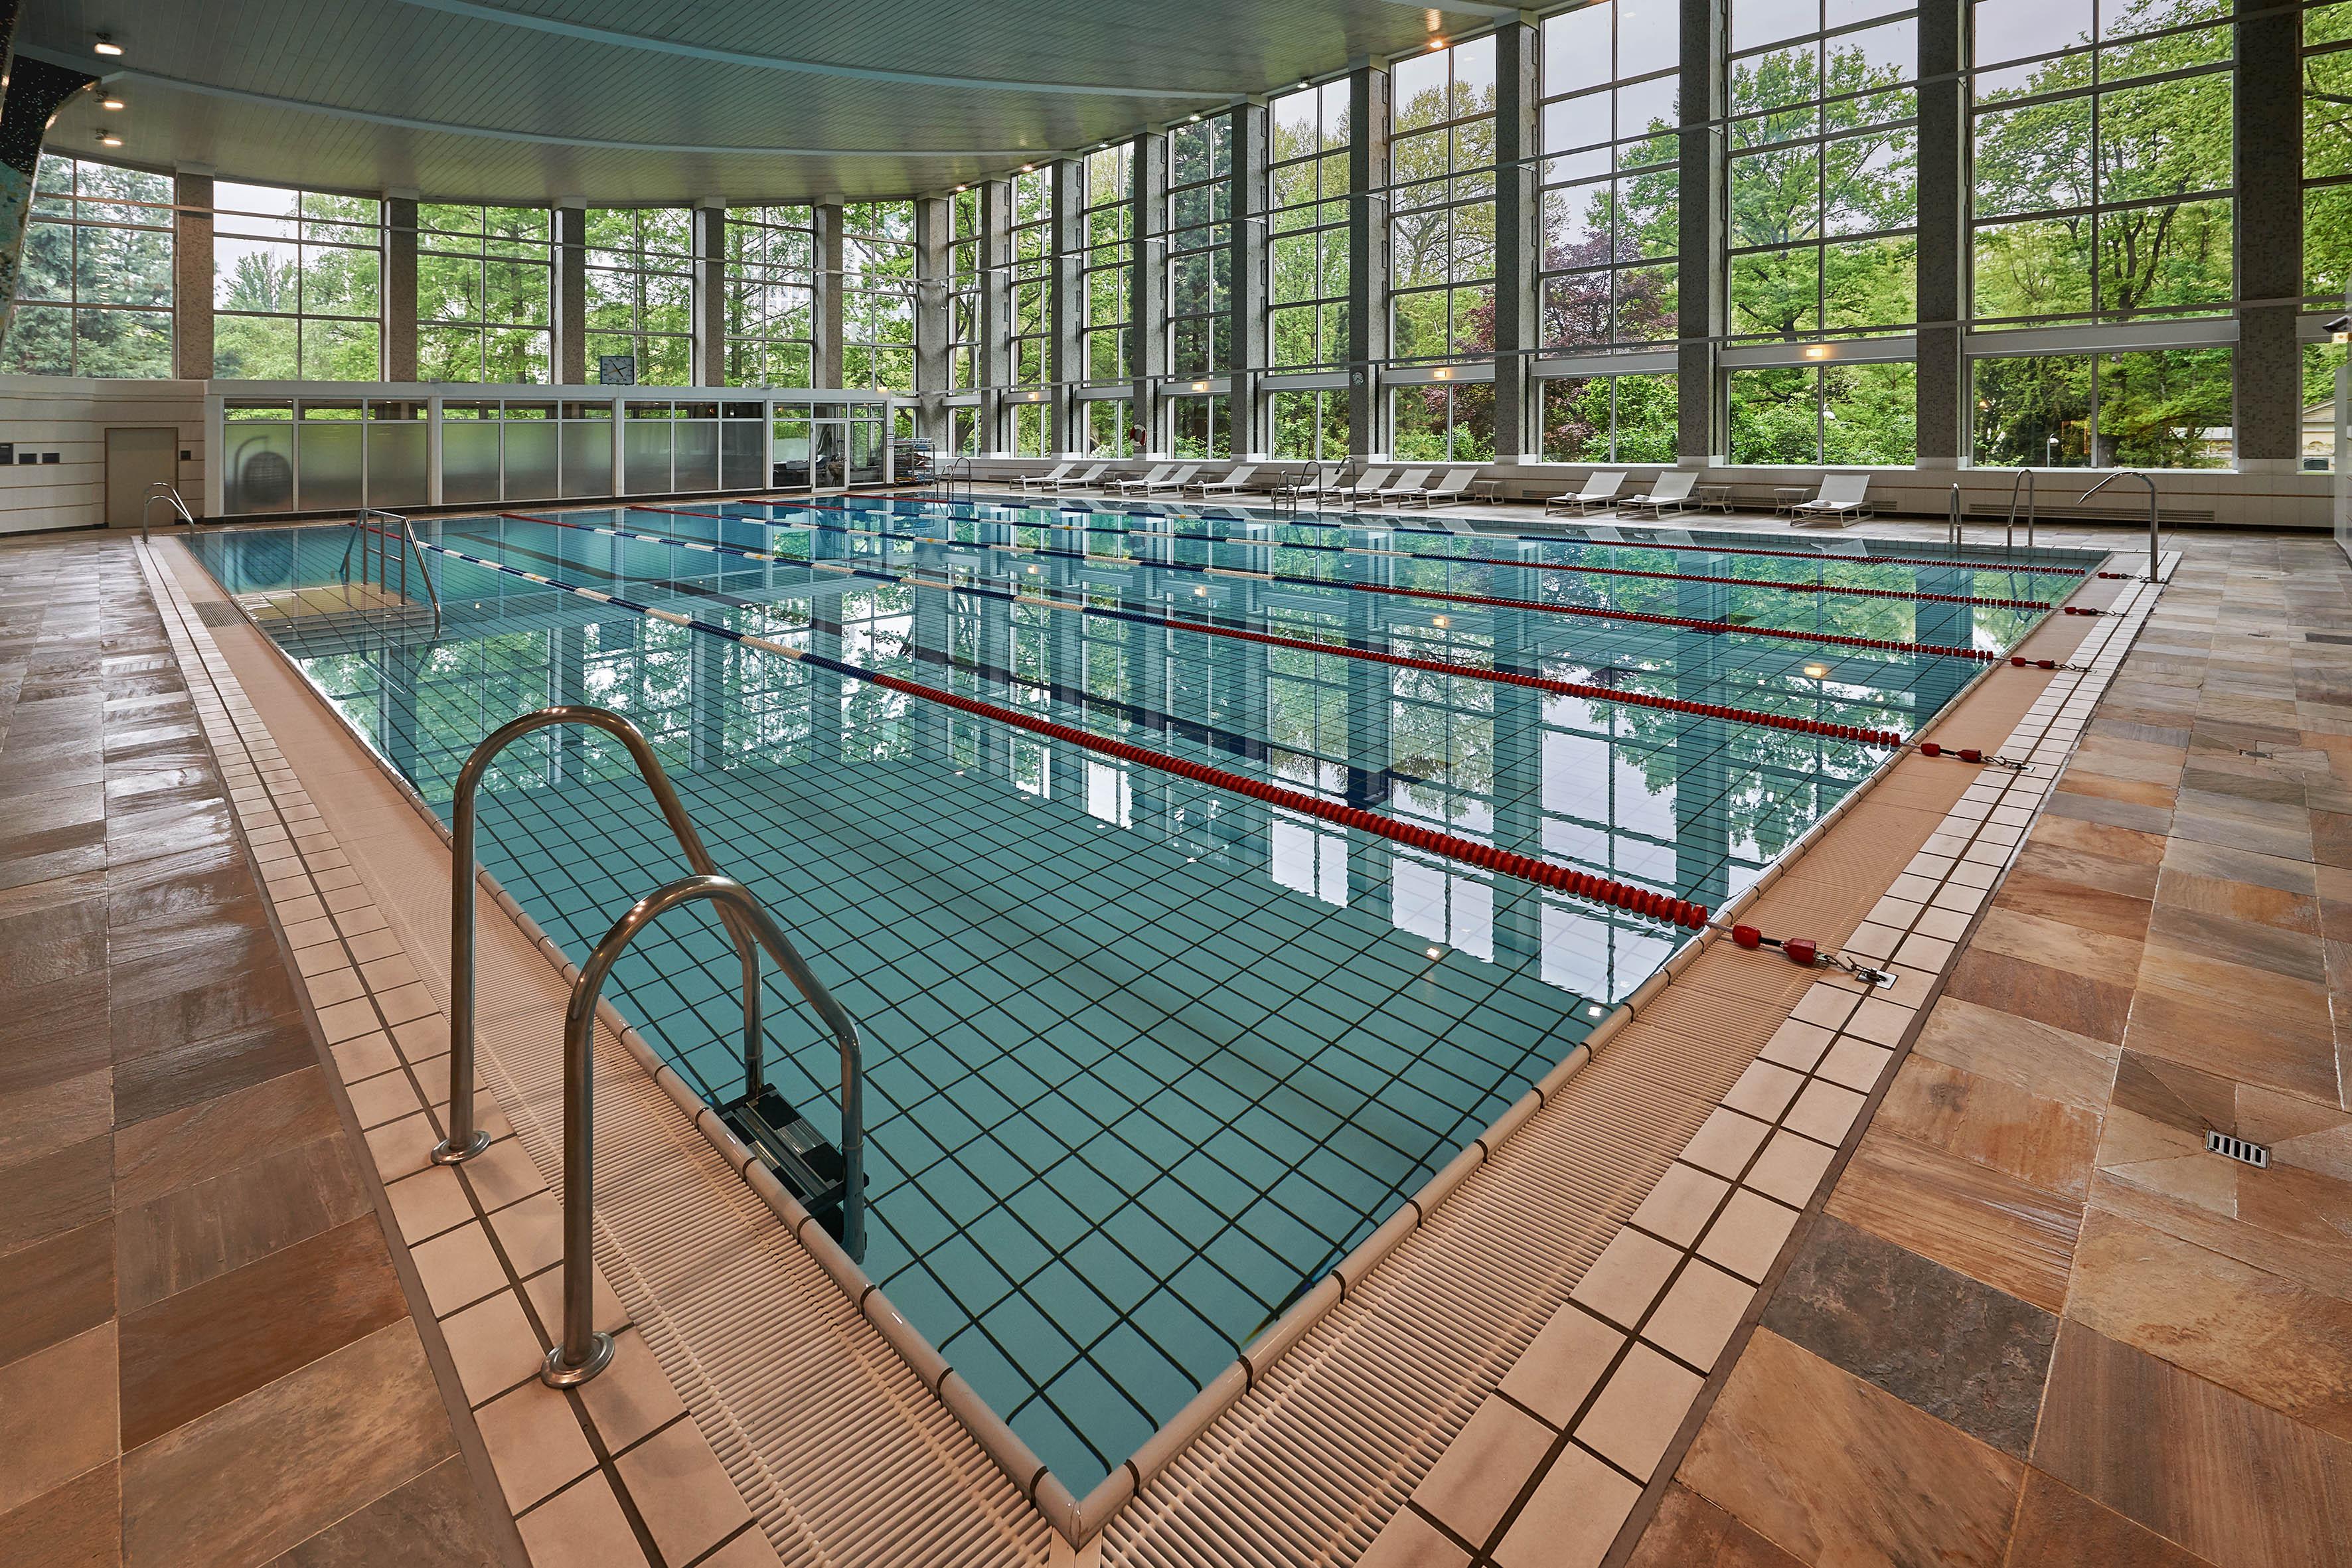 Erholungs aufenthalt im 5 sterne hilton frankfurt mit therme spa und fr hst ck fcam blog - Pool frankfurt ...